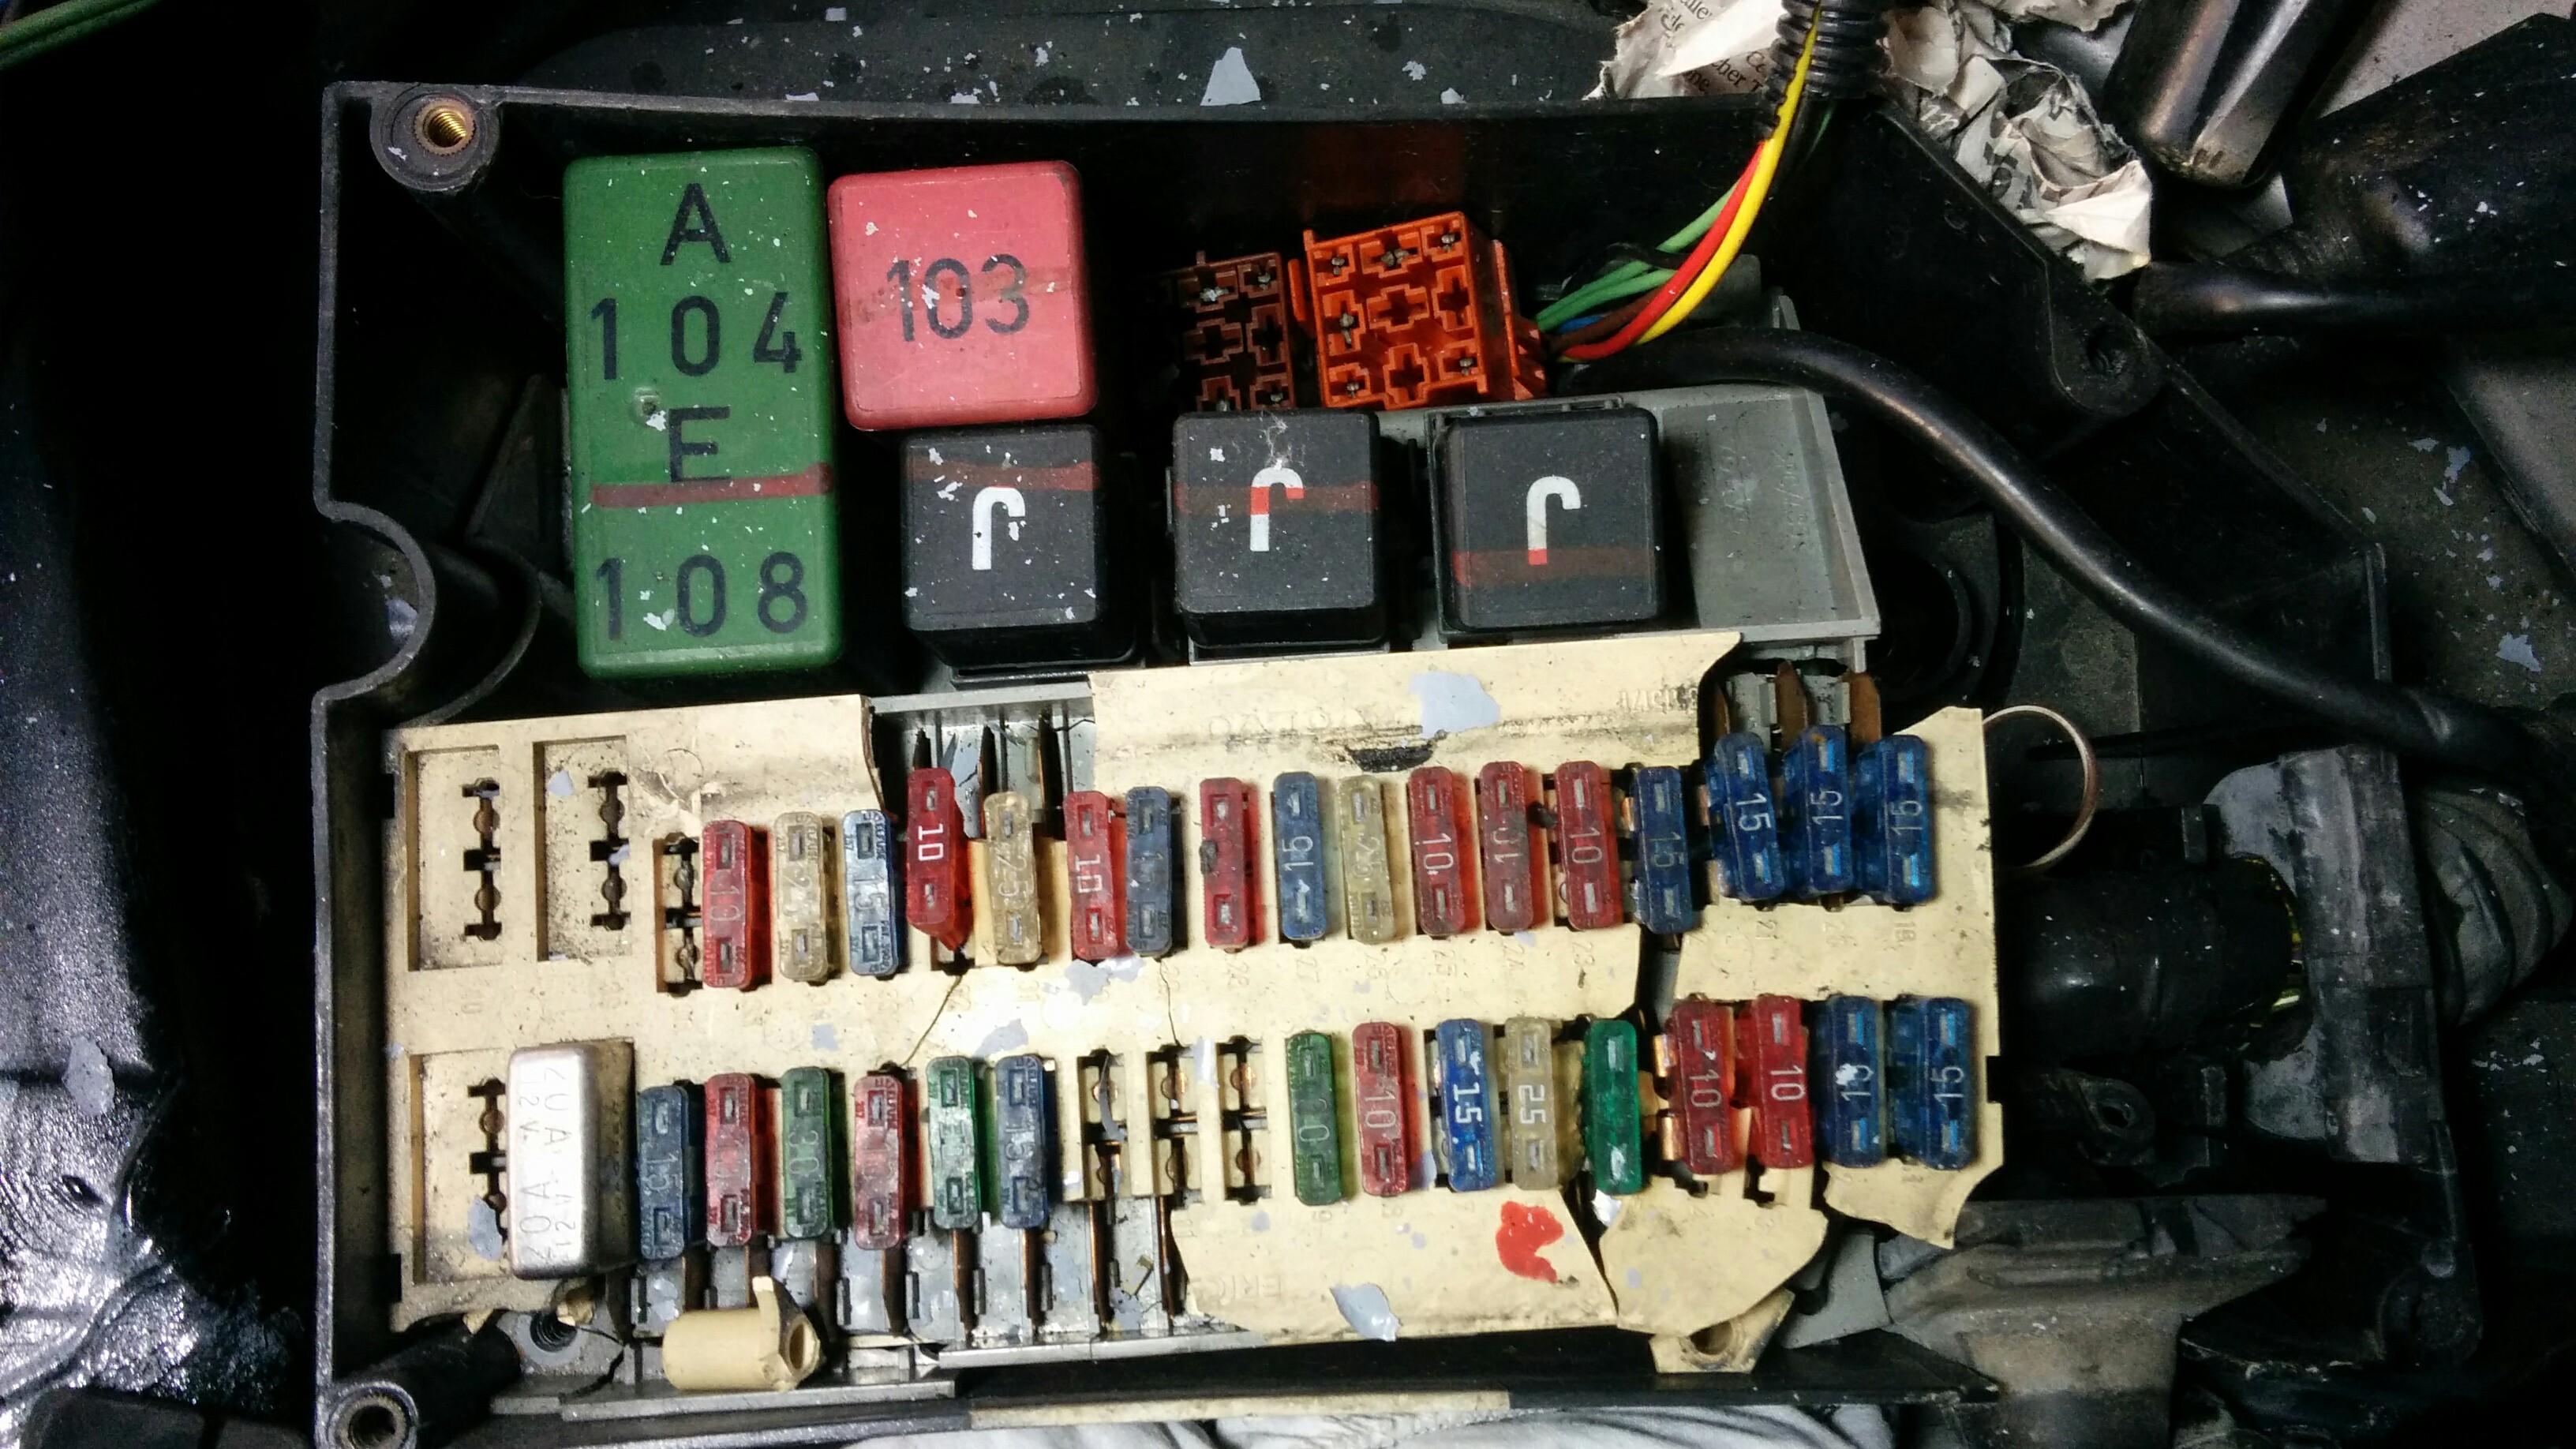 EK_9459] 1995 Volvo Fuse Diagram Schematic WiringWeveq Rele Mohammedshrine Librar Wiring 101